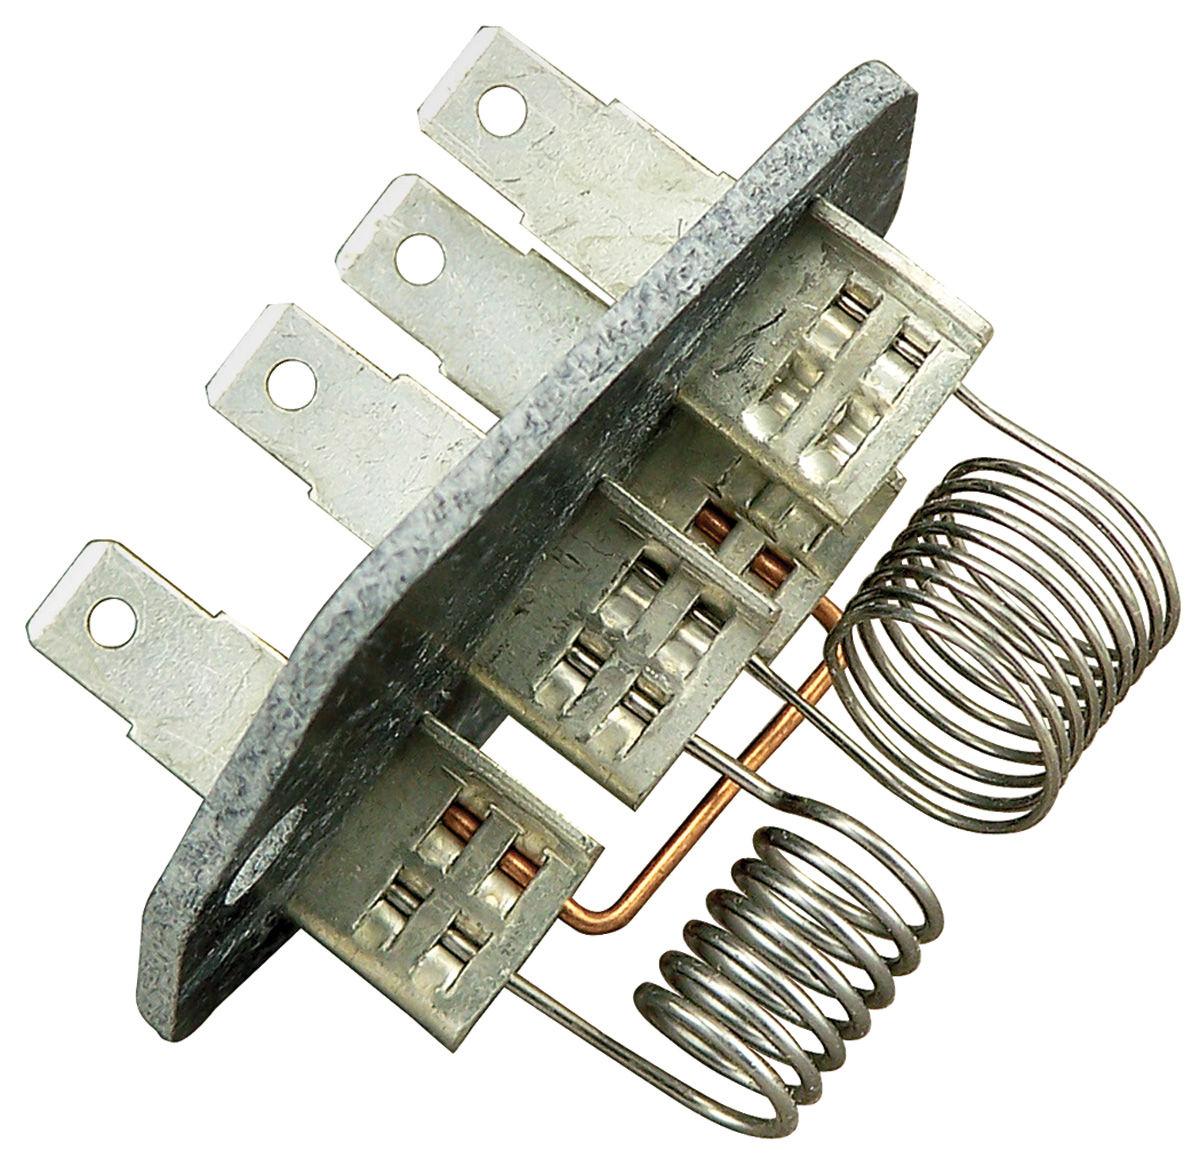 Blower Motor Resistor, 40 40 Pontiac/40 40 Cutlass